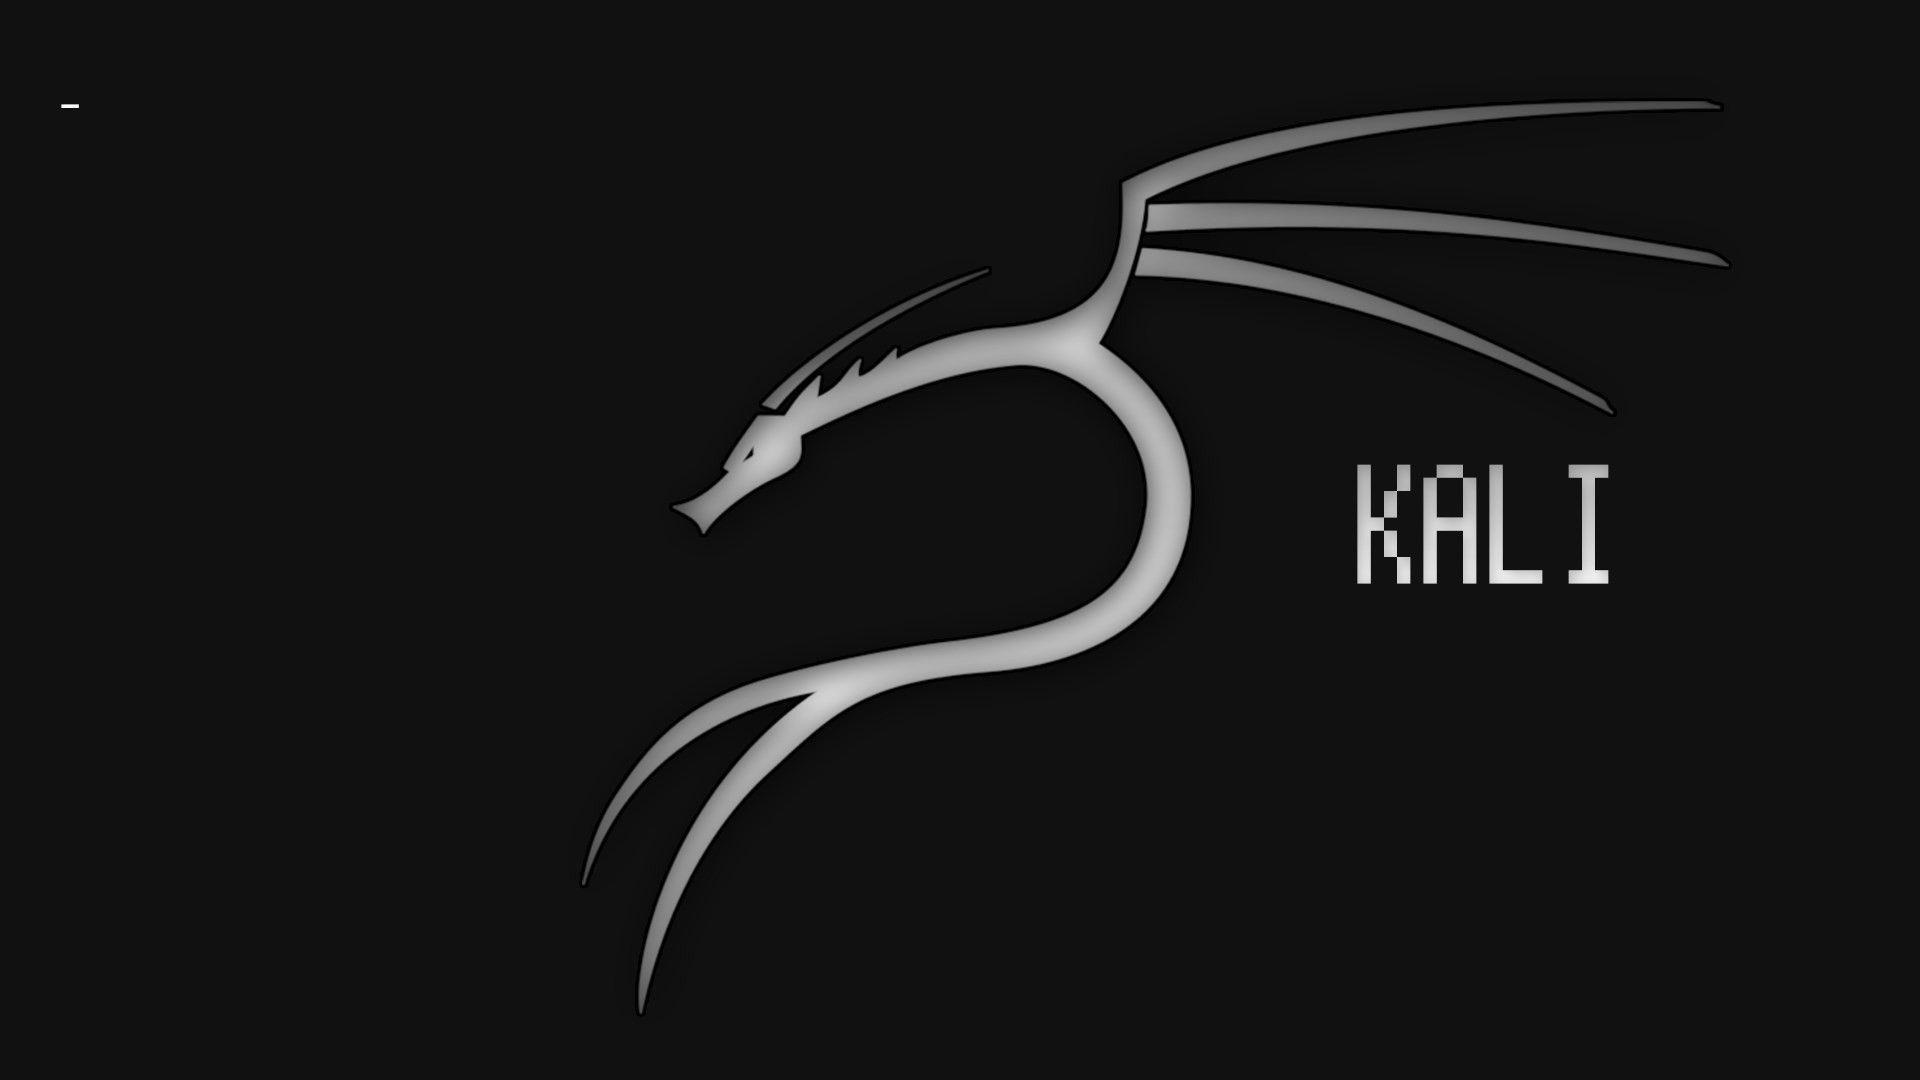 Kali Linux Wallpapers 1920x1080 Wallpaper Cave